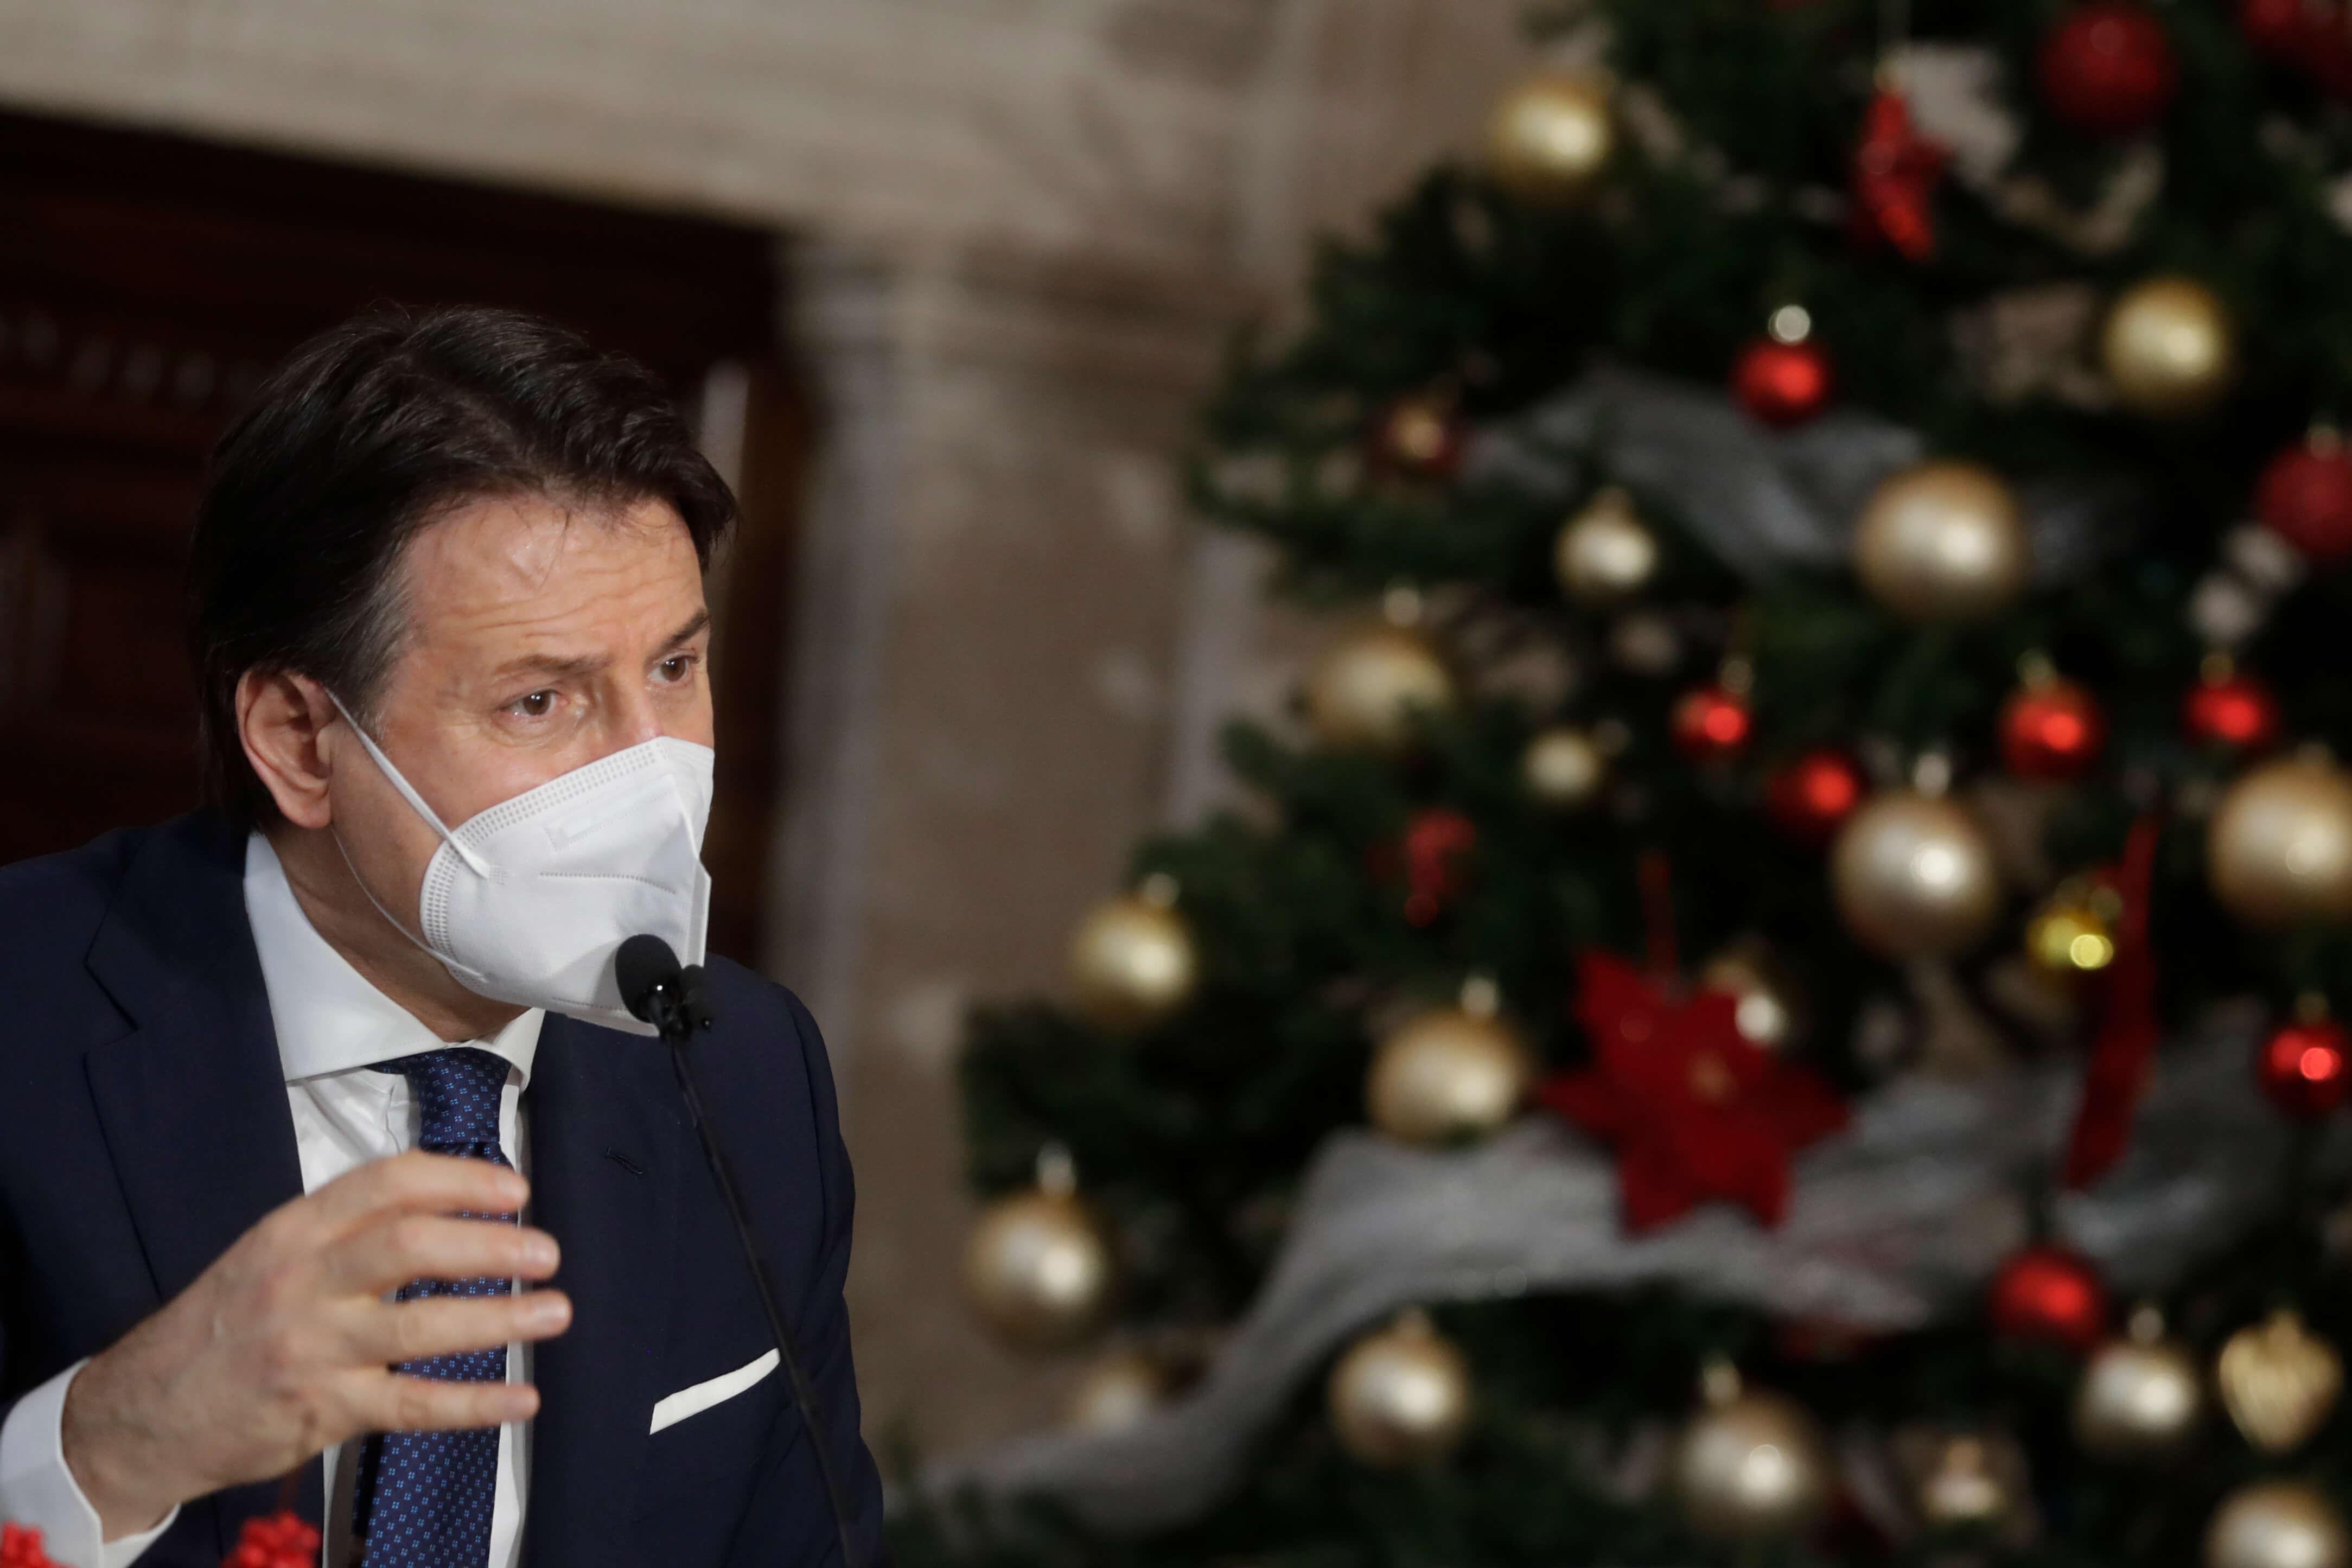 Italy extends virus curbs, delays high school start